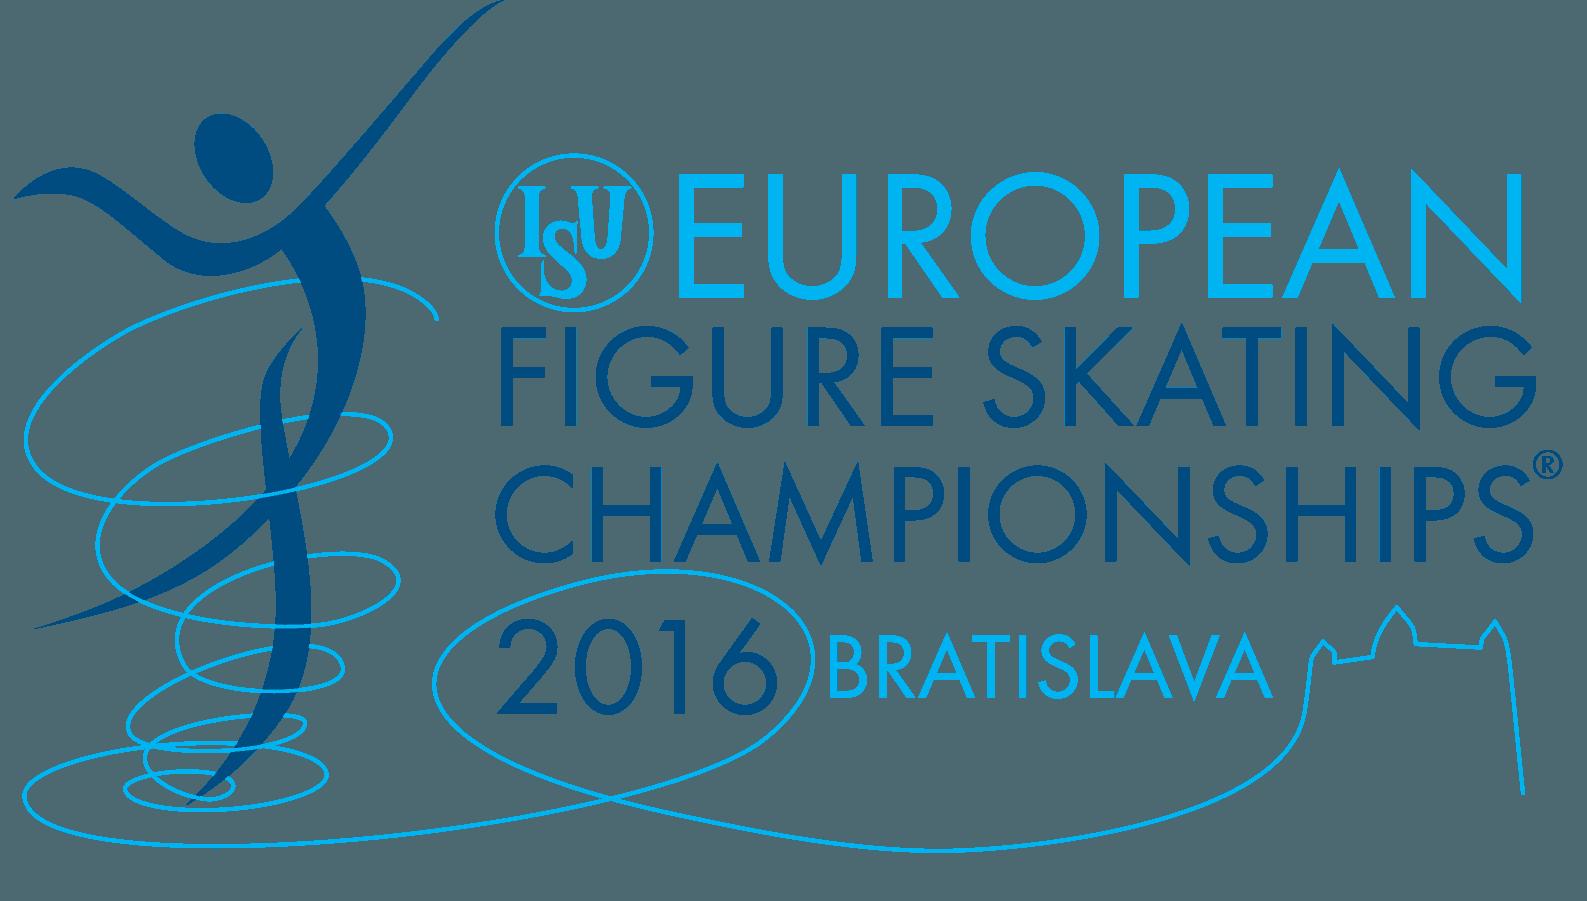 EUROPEAN FIGURE SKATING CHAMPIONSHIPS 2016 BRATISLAVA